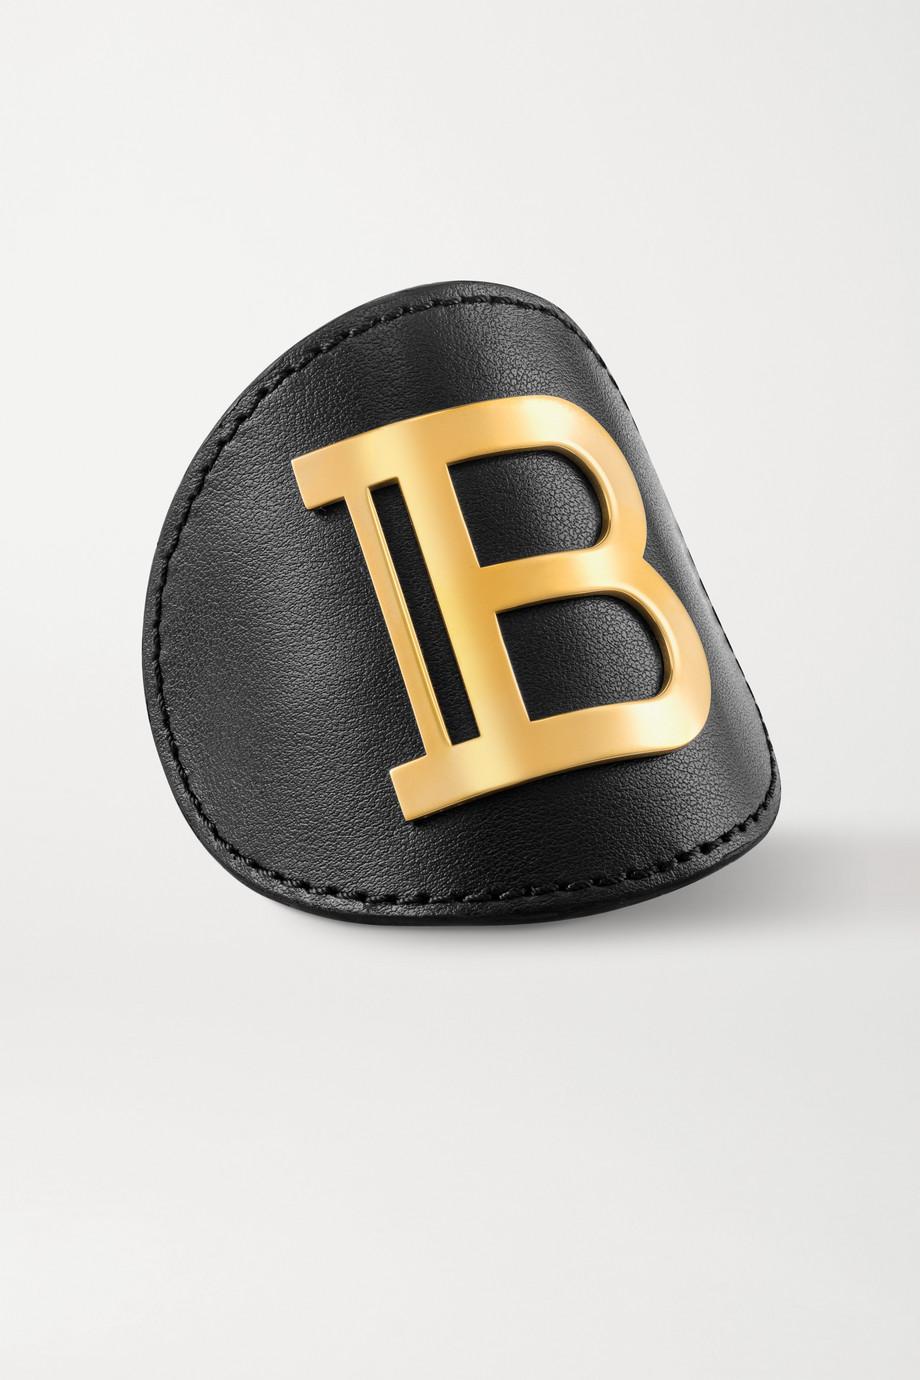 Balmain Paris Hair Couture Leather and gold-plated hair clip